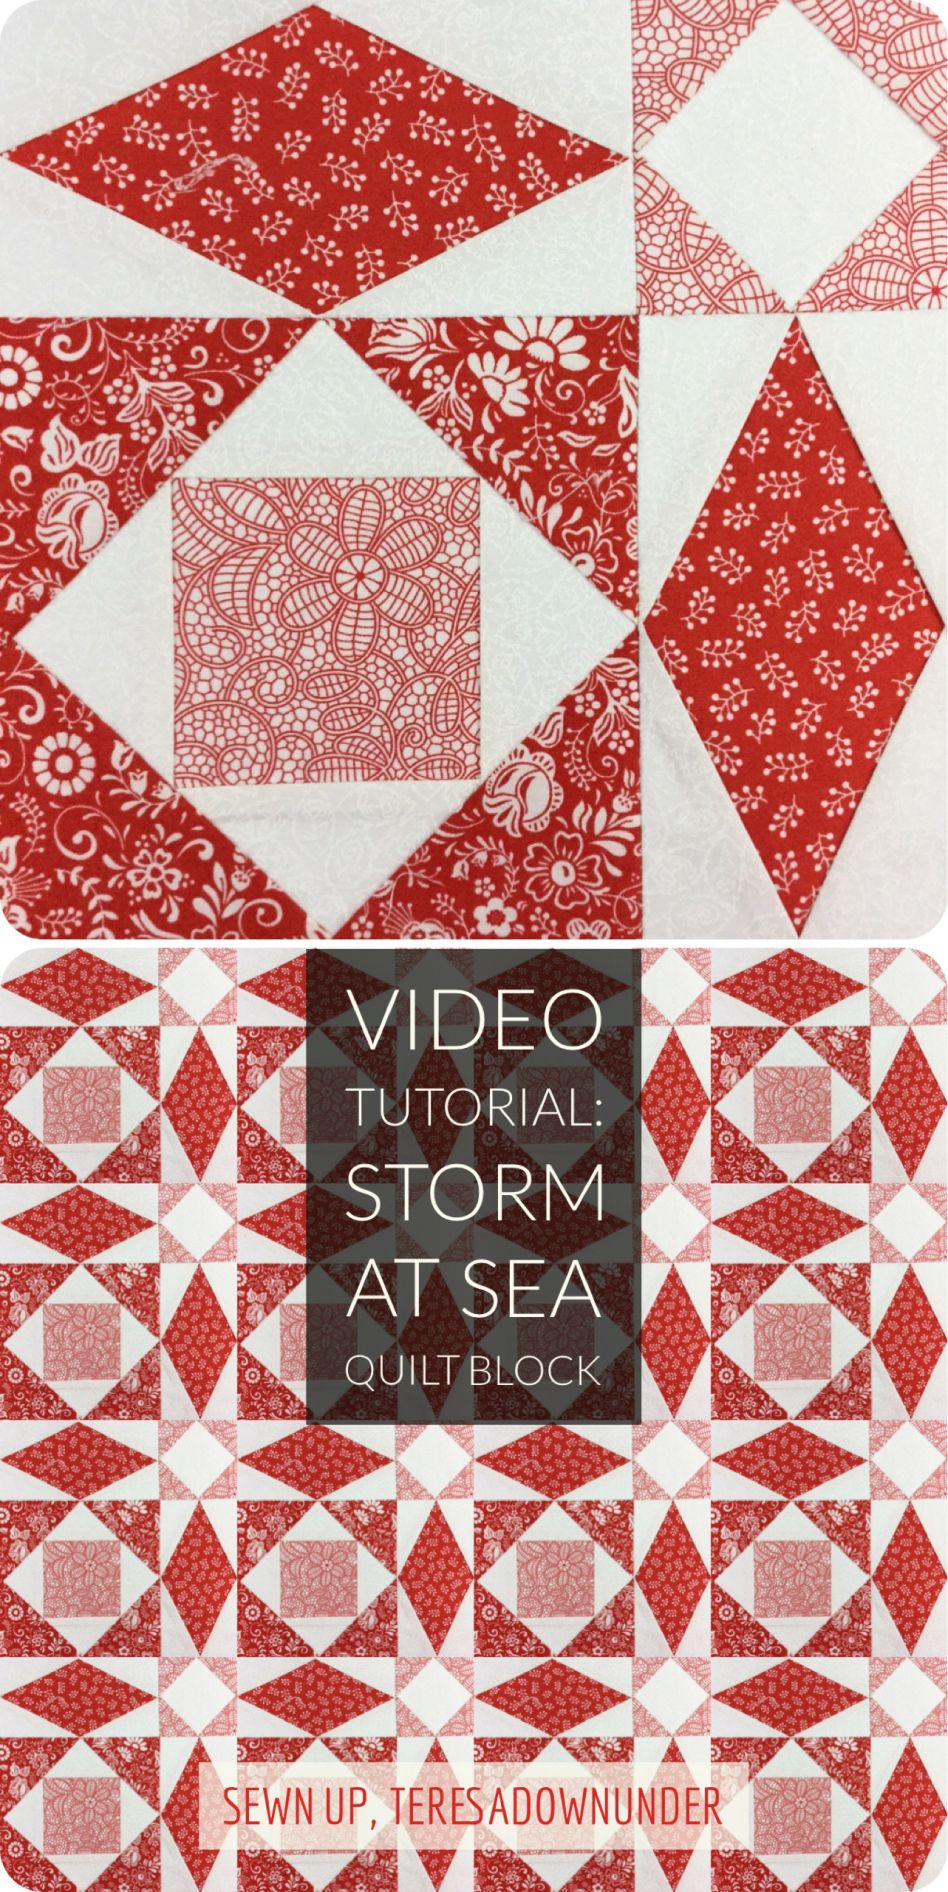 Video Tutorial Storm At Sea Quilt Block Version 1 Storm At